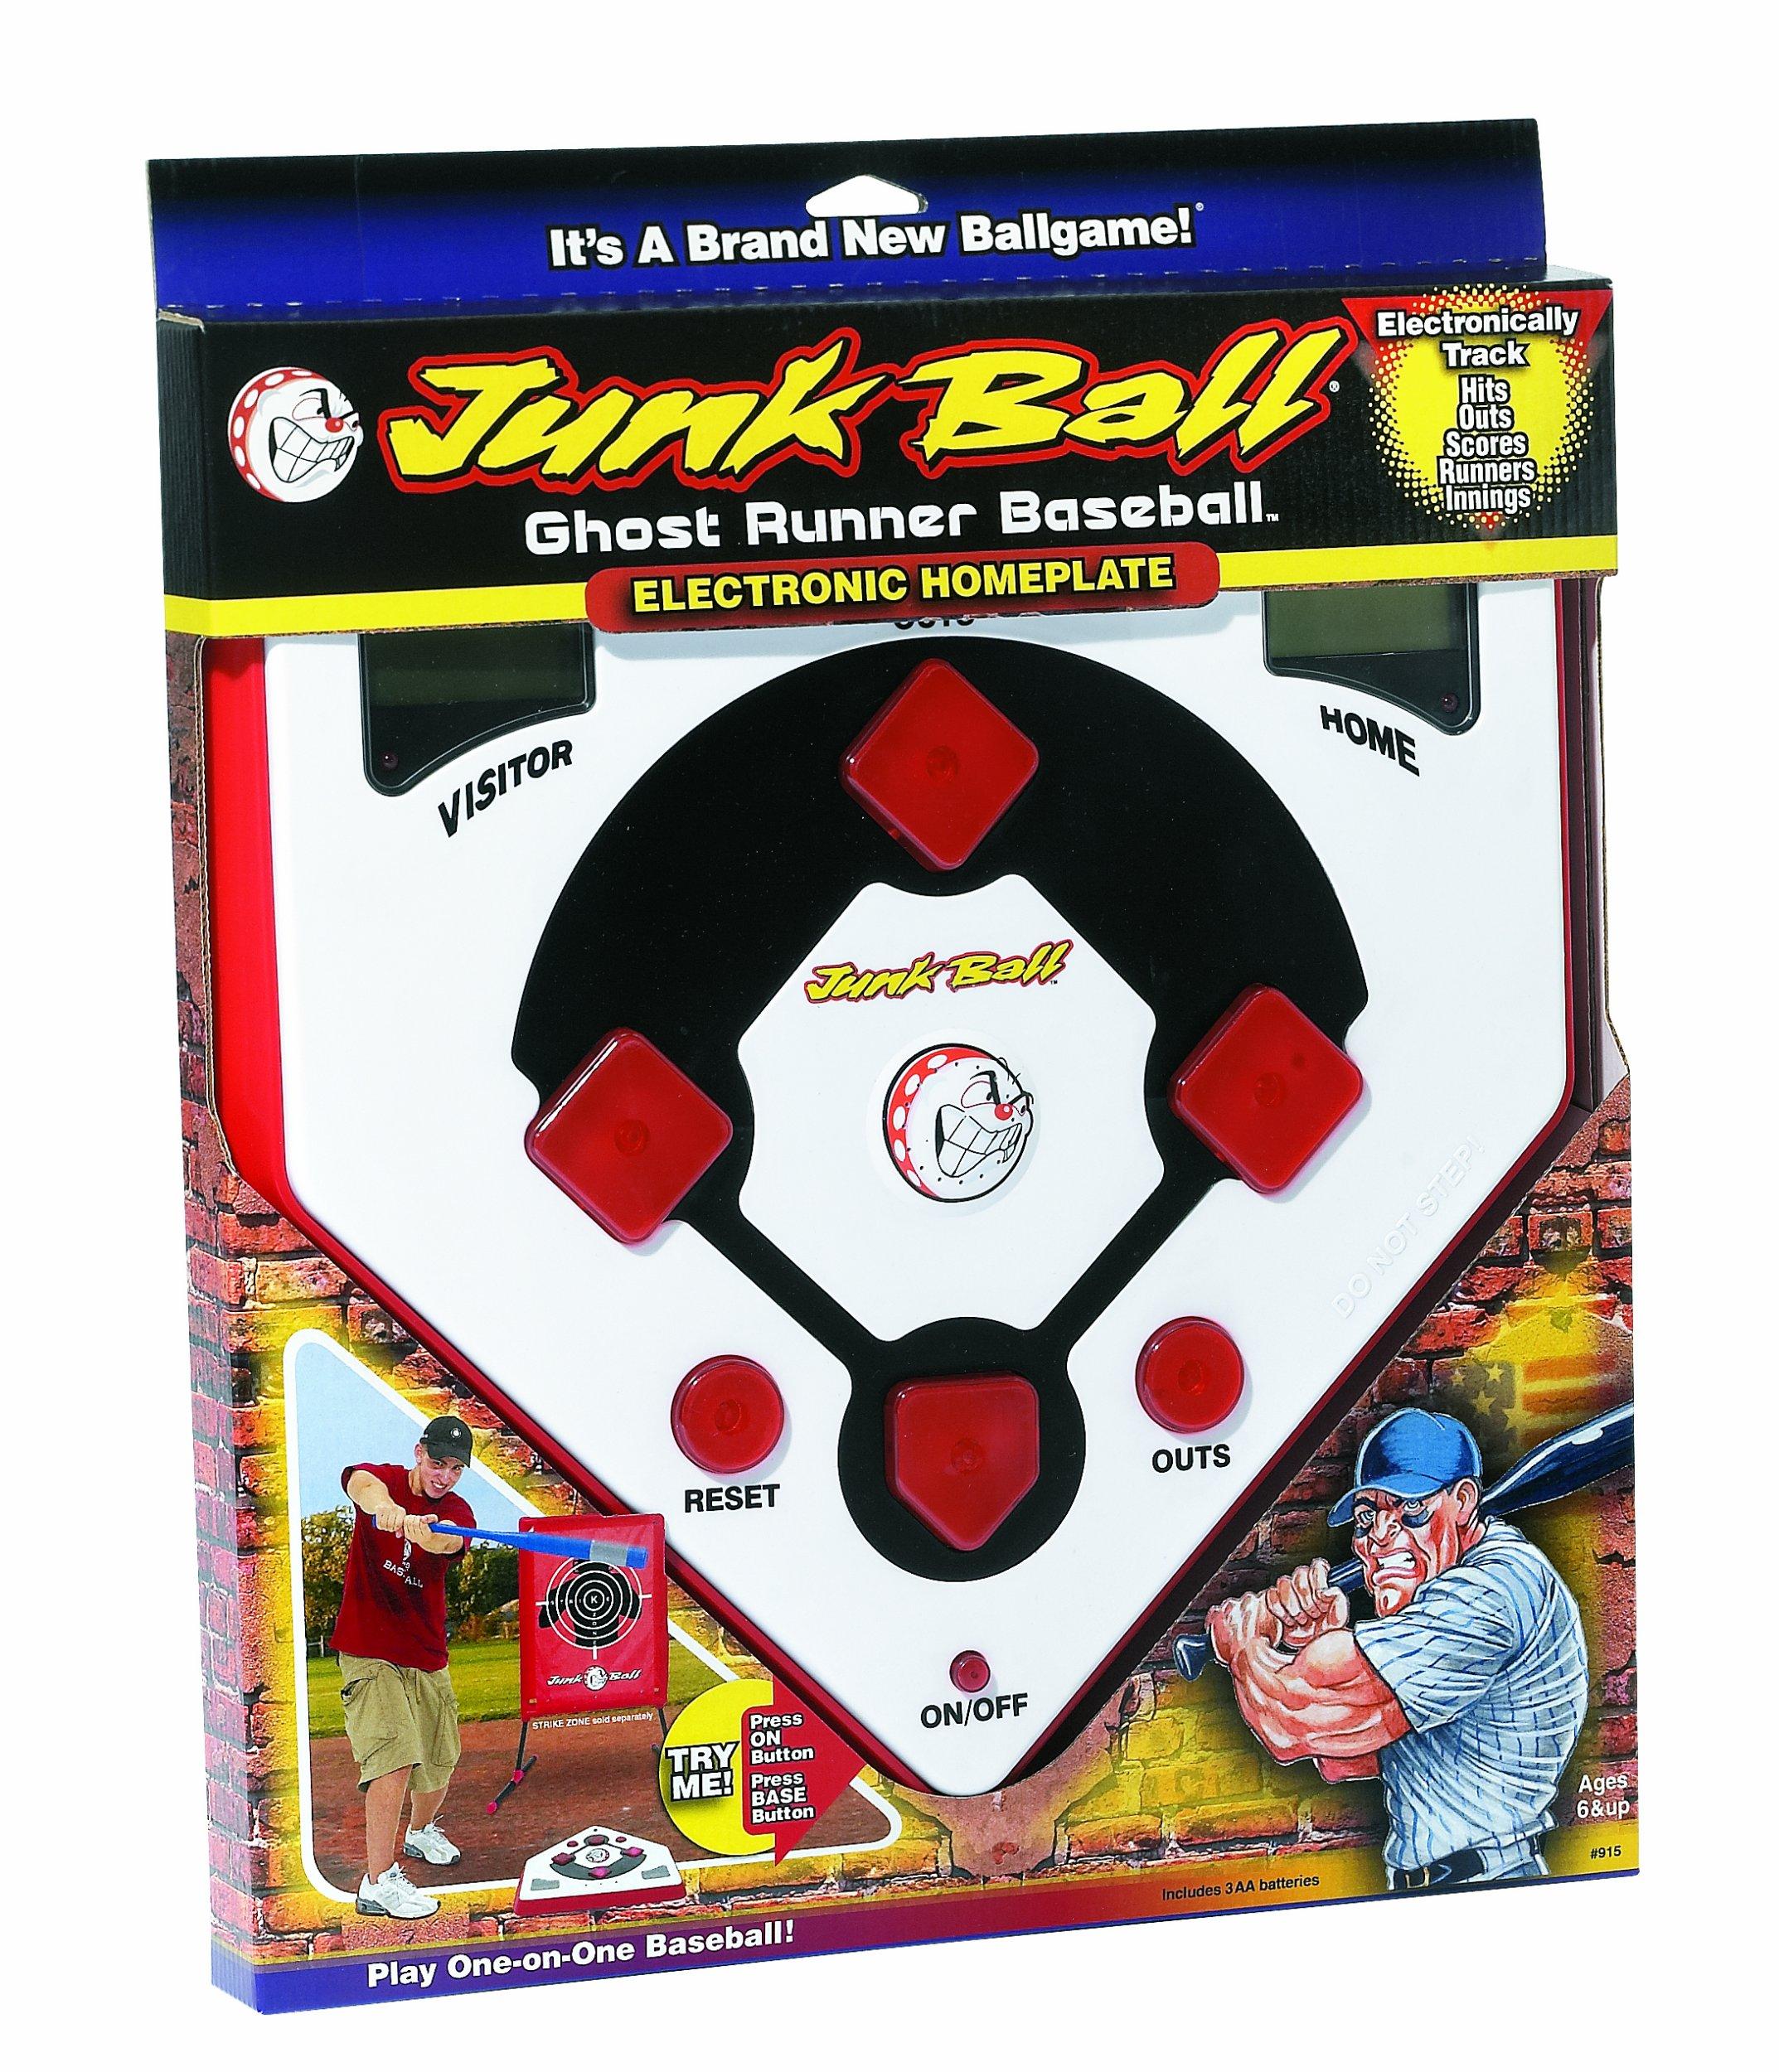 Little Kids Junk Ball Ghost Runner Baseball Electronic Home Plate by Little Kids